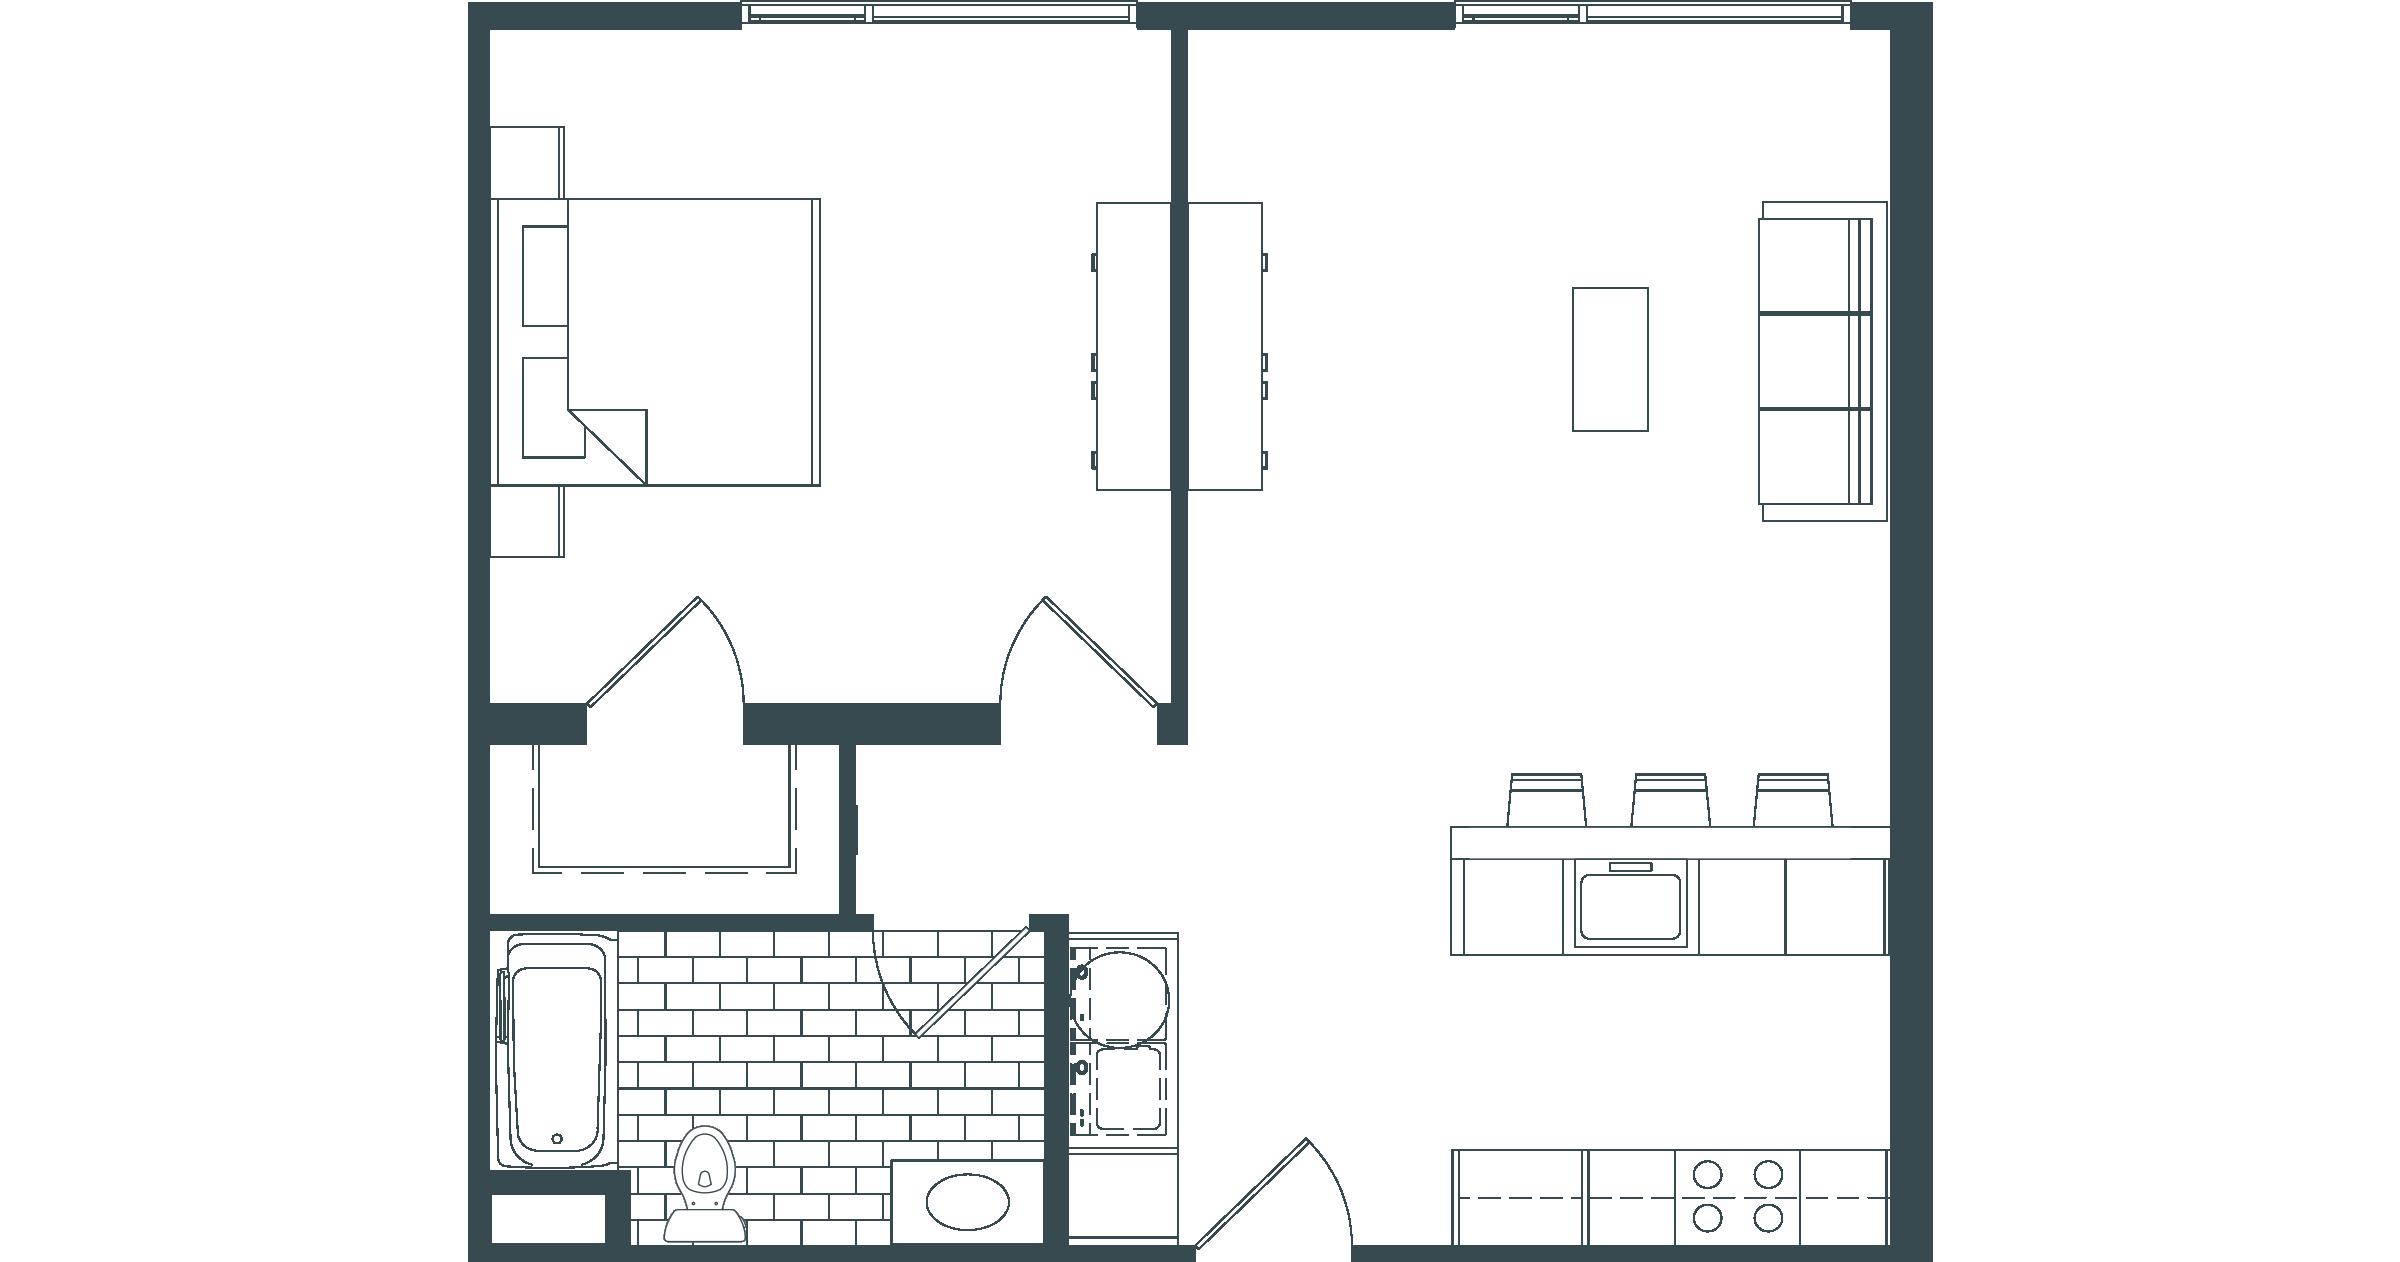 A1 Floorplan